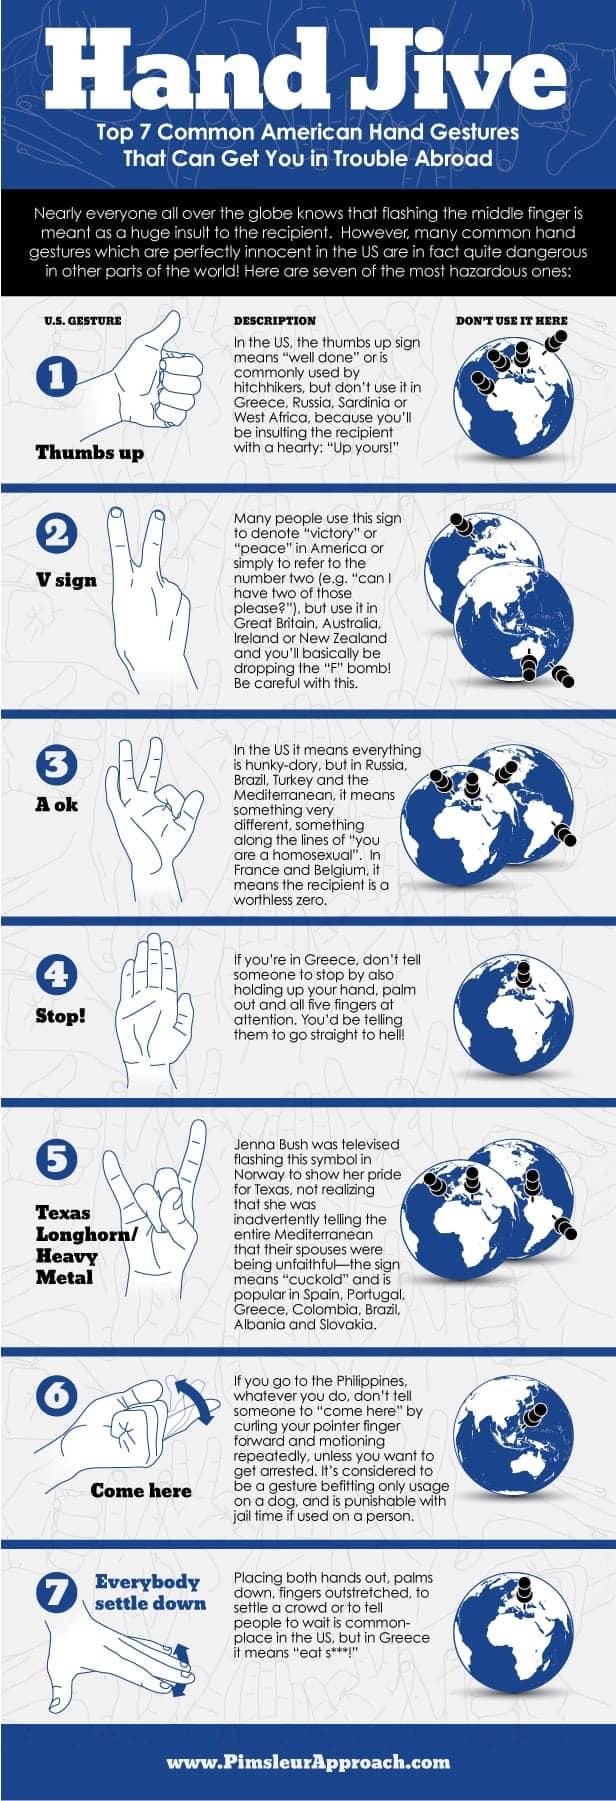 Hand jive infographic